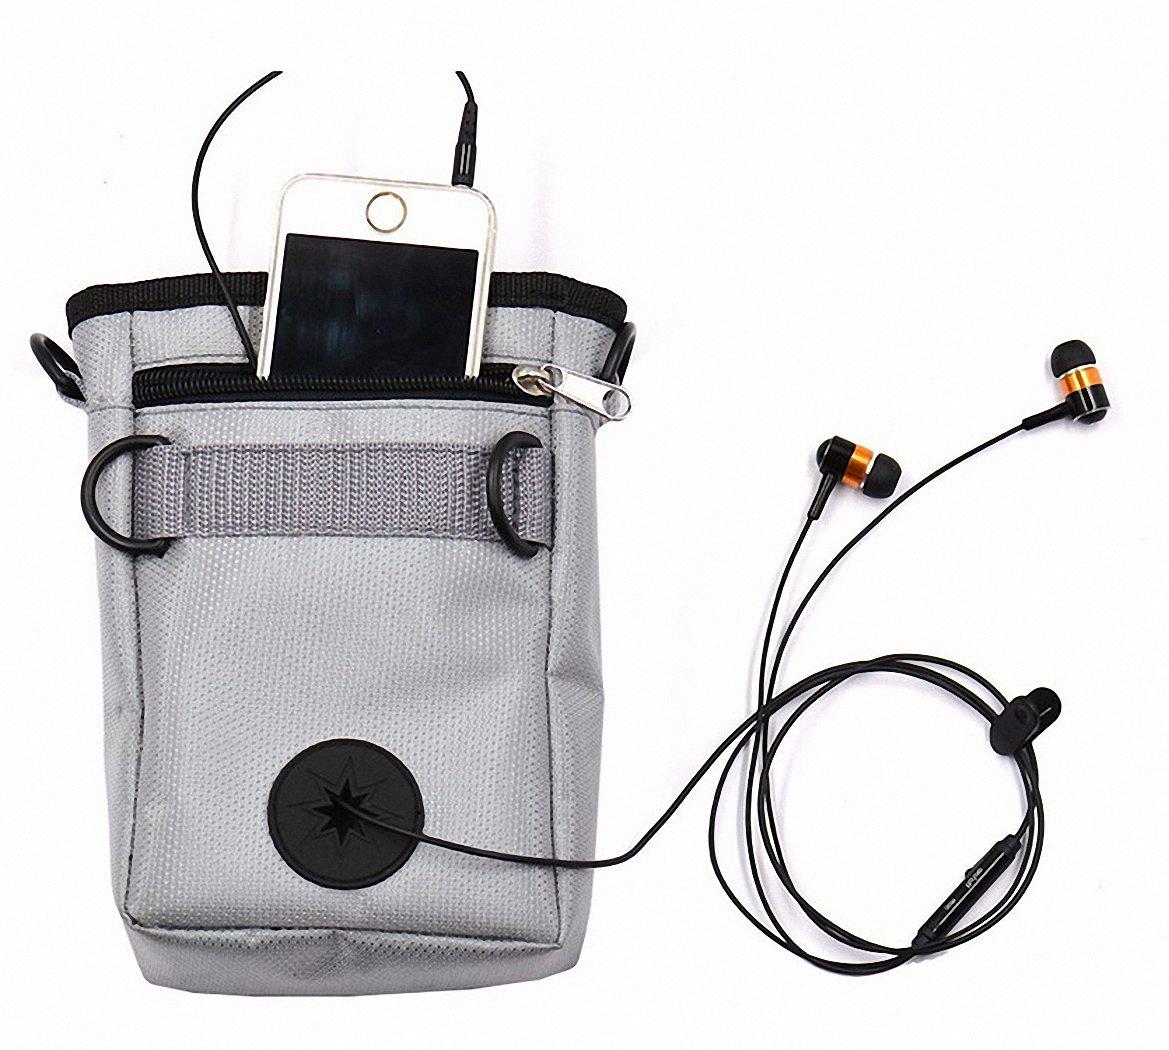 DrecratART Dog Treat Pouch, Nylon Oxford Tote Bag, Poop Bag Dispenser, Earphones Dispenser, Adjustable Waist Belt, Carry Snacks and Toys - Grey